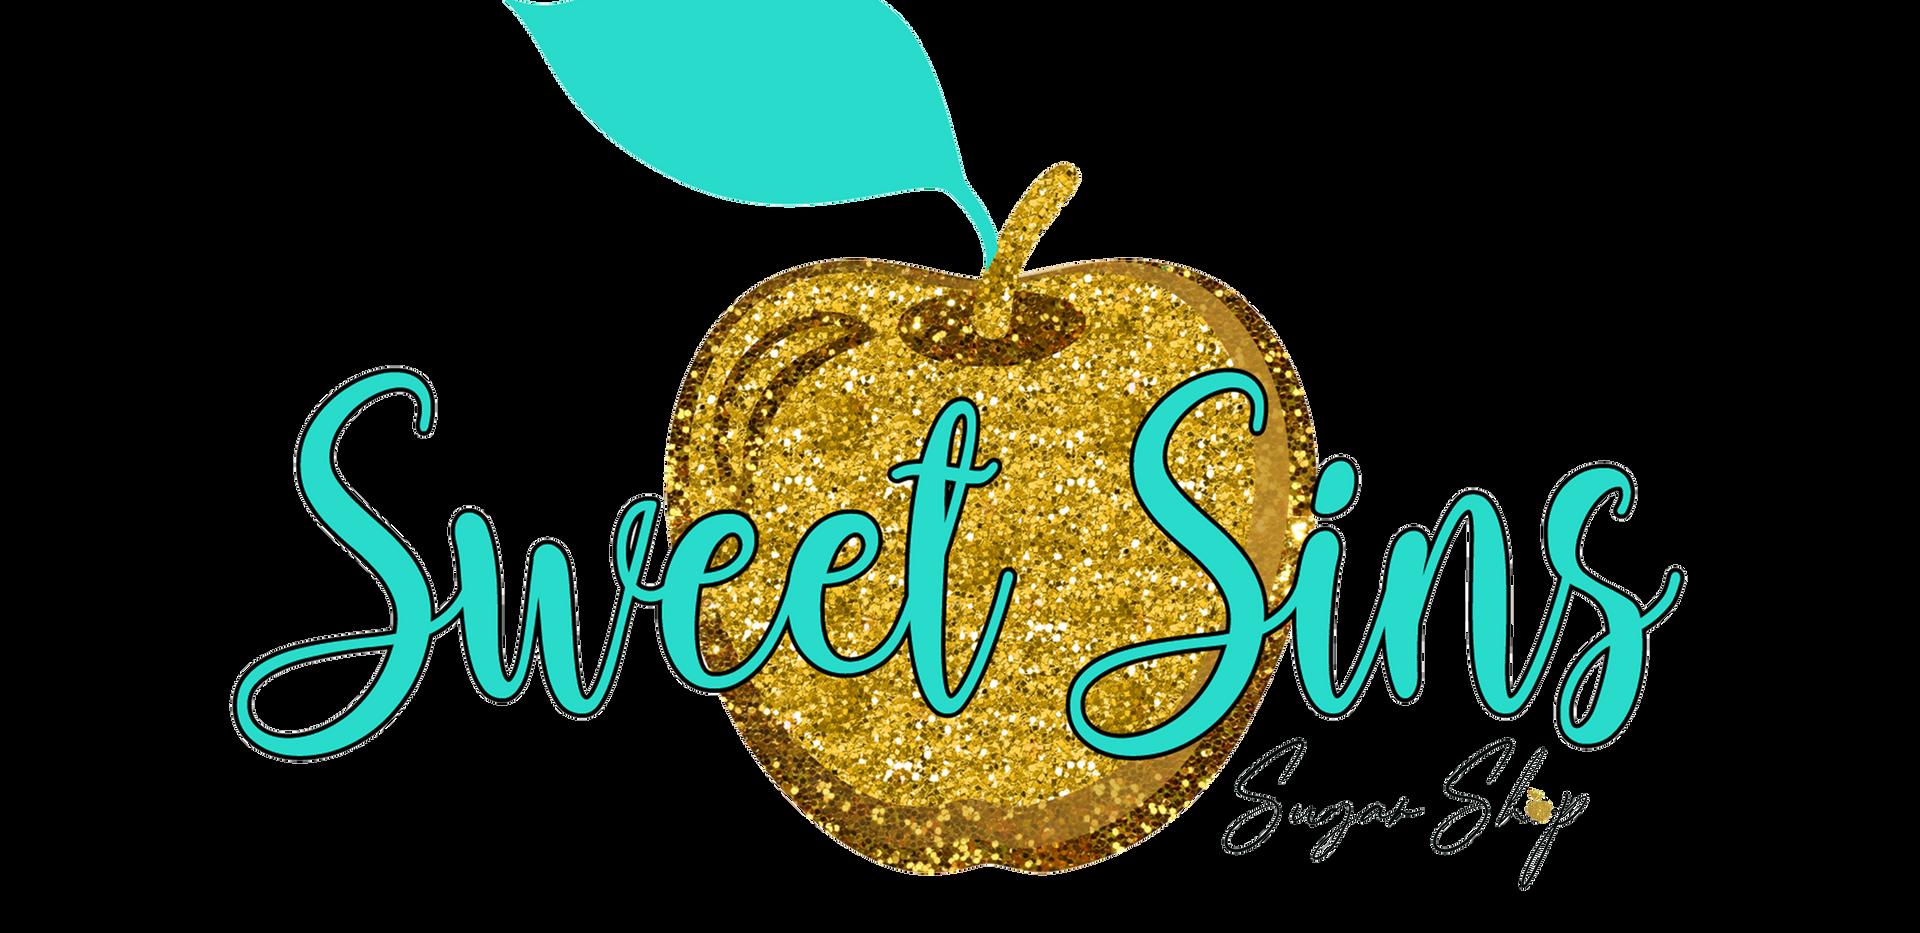 sweetsin1.png